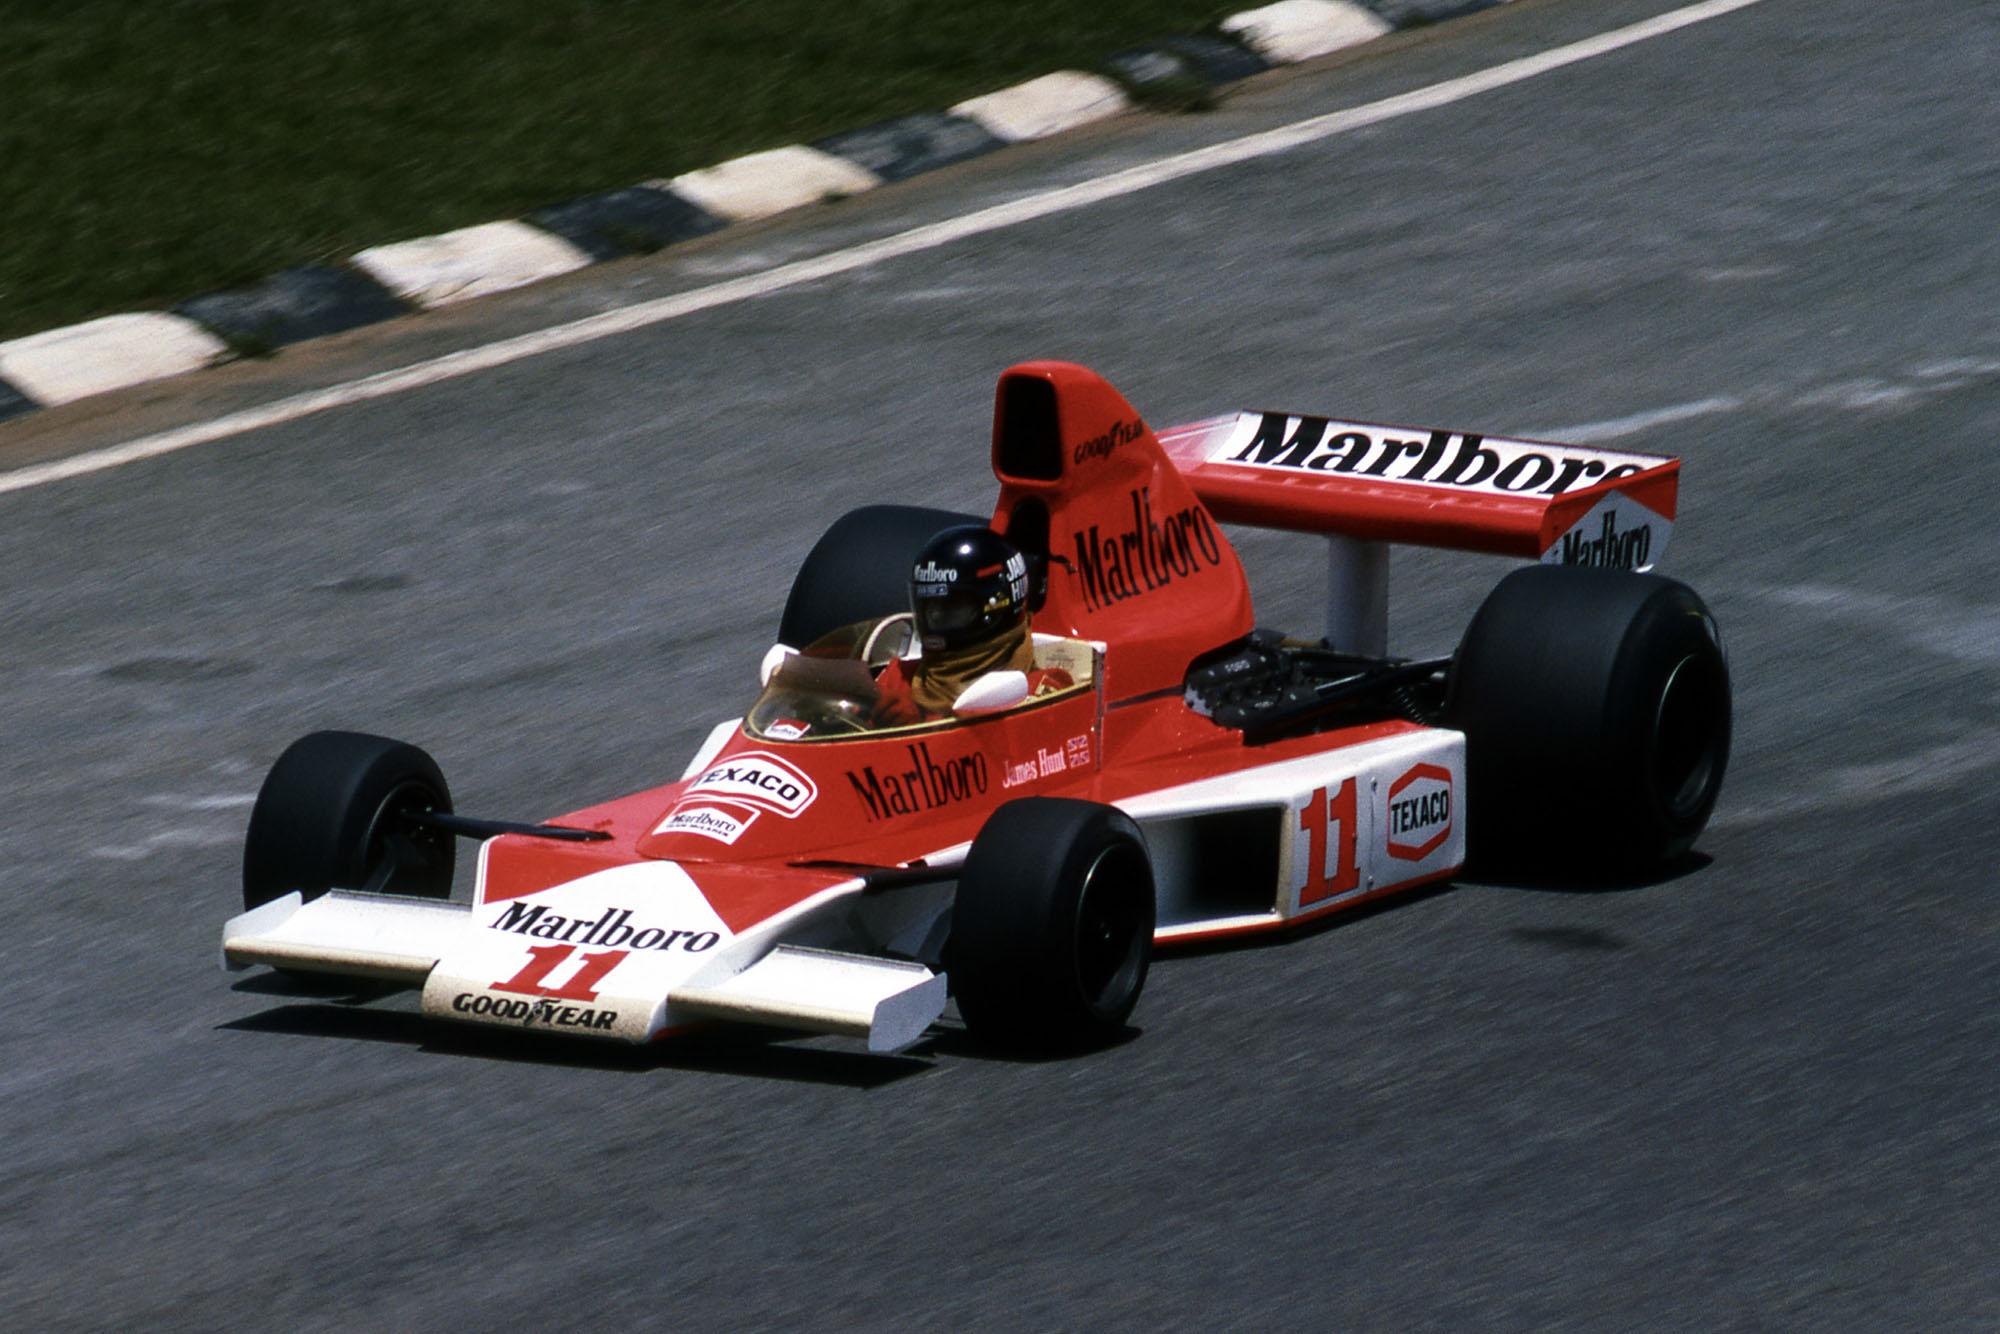 James Hunt driving for McLaren at the 1976 Brazilian Grand Prix, Interlagos.